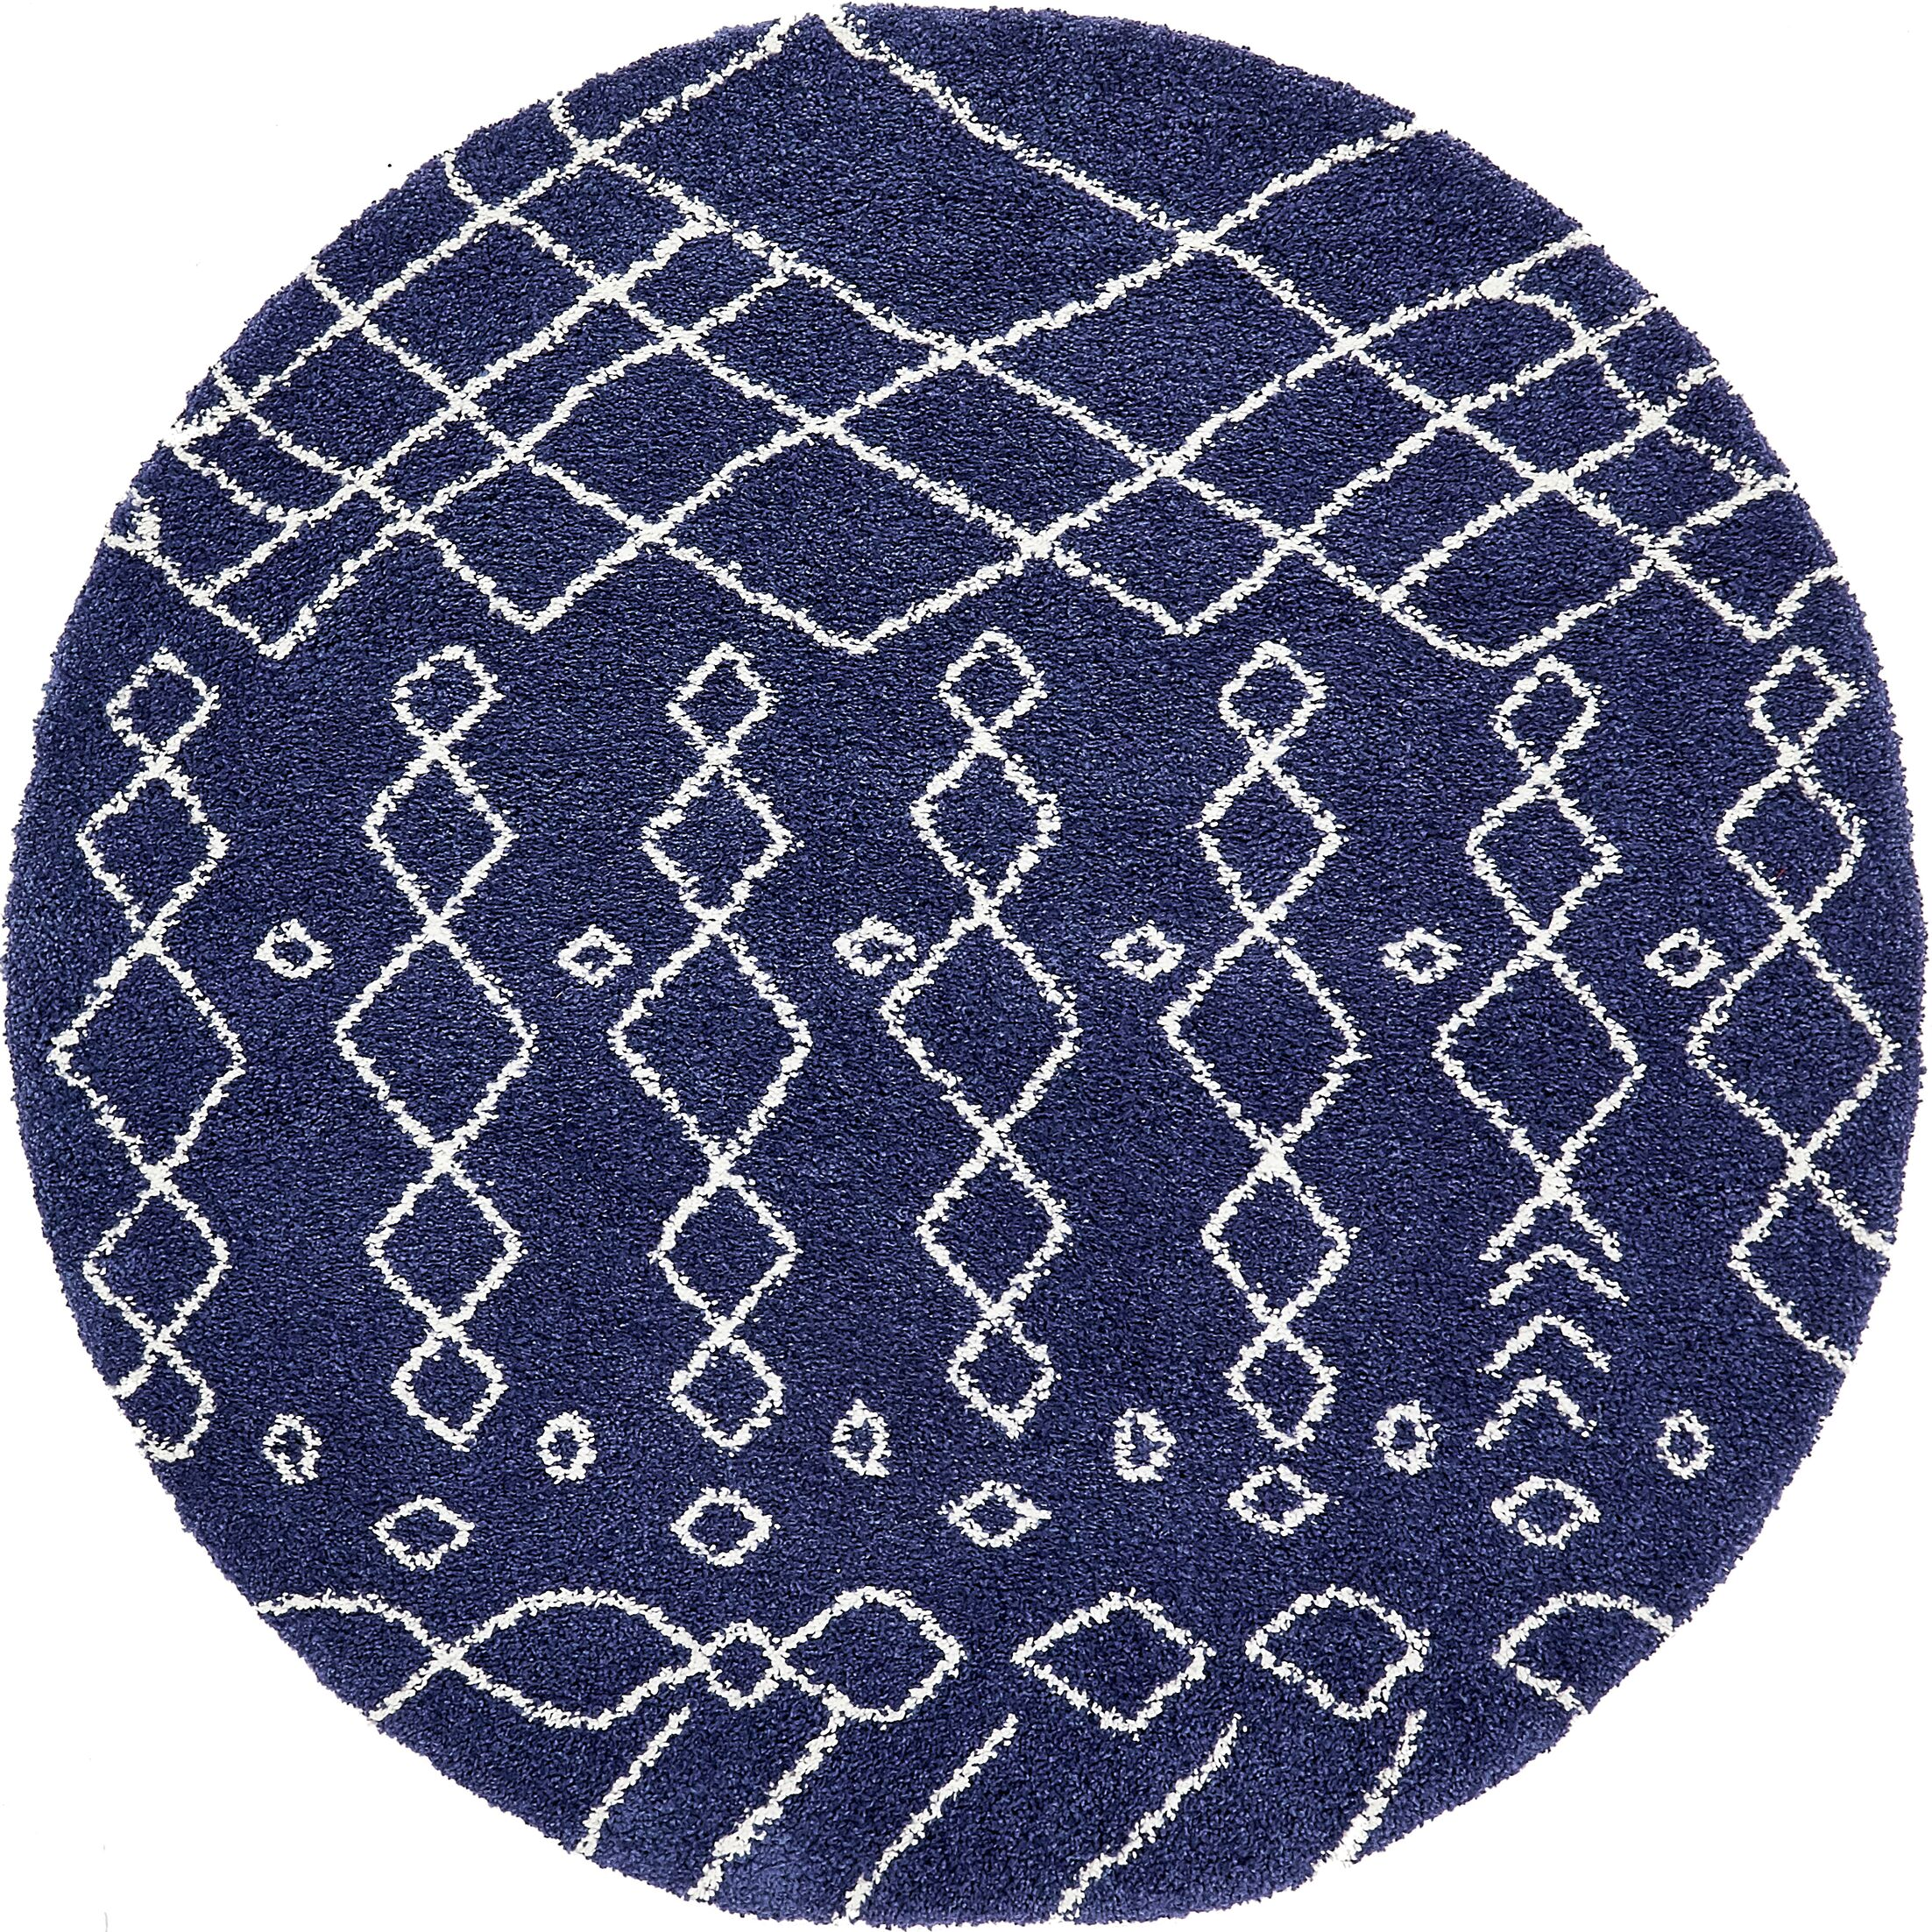 Bourne Machine woven Navy Blue Area Rug Rug Size: Round 8'